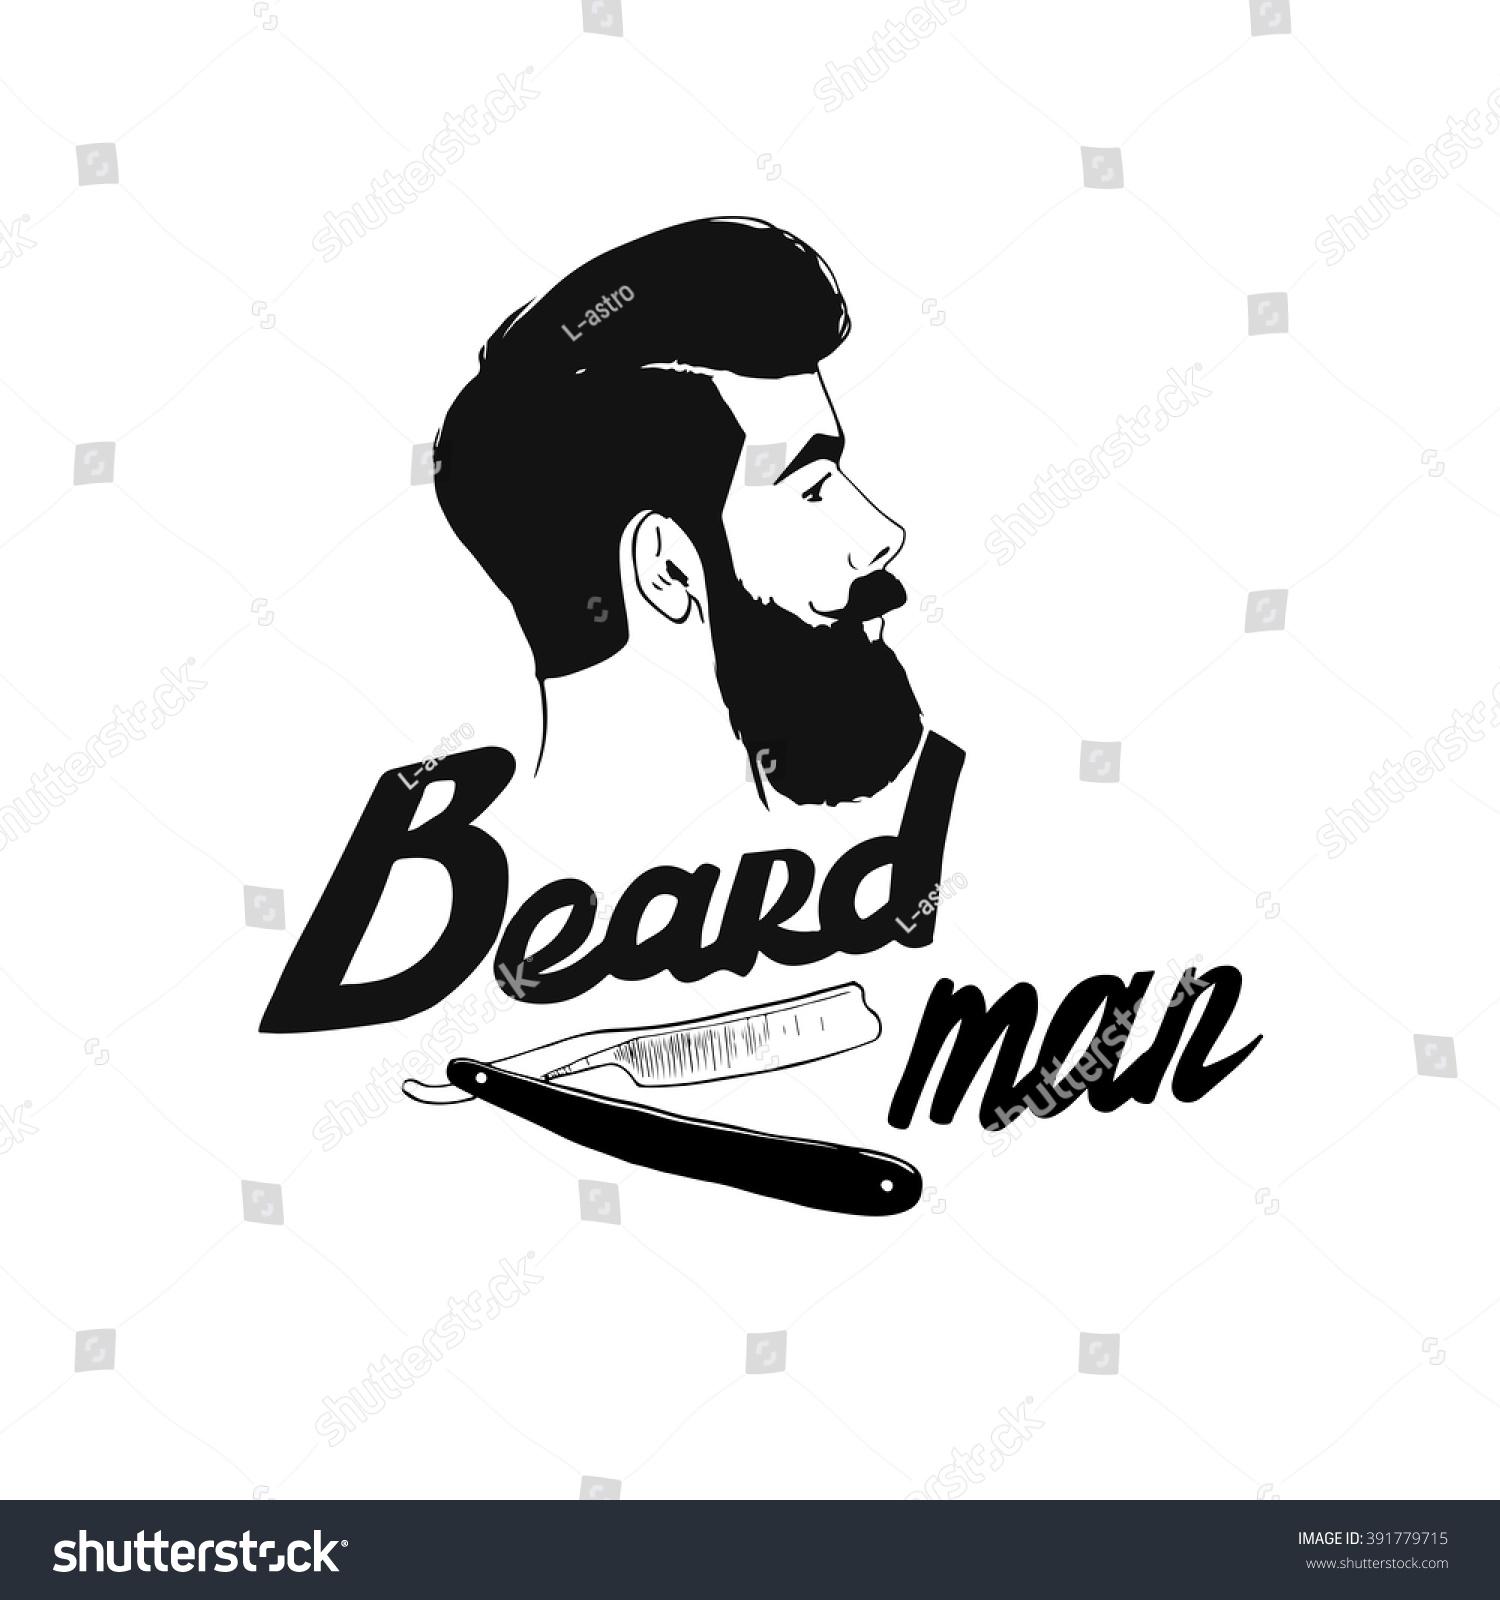 Clip art vector of vintage barber shop logo graphics and icon vector - Vector Hipster Barber Shop Logo Icon Beard Scissors Comb Razor